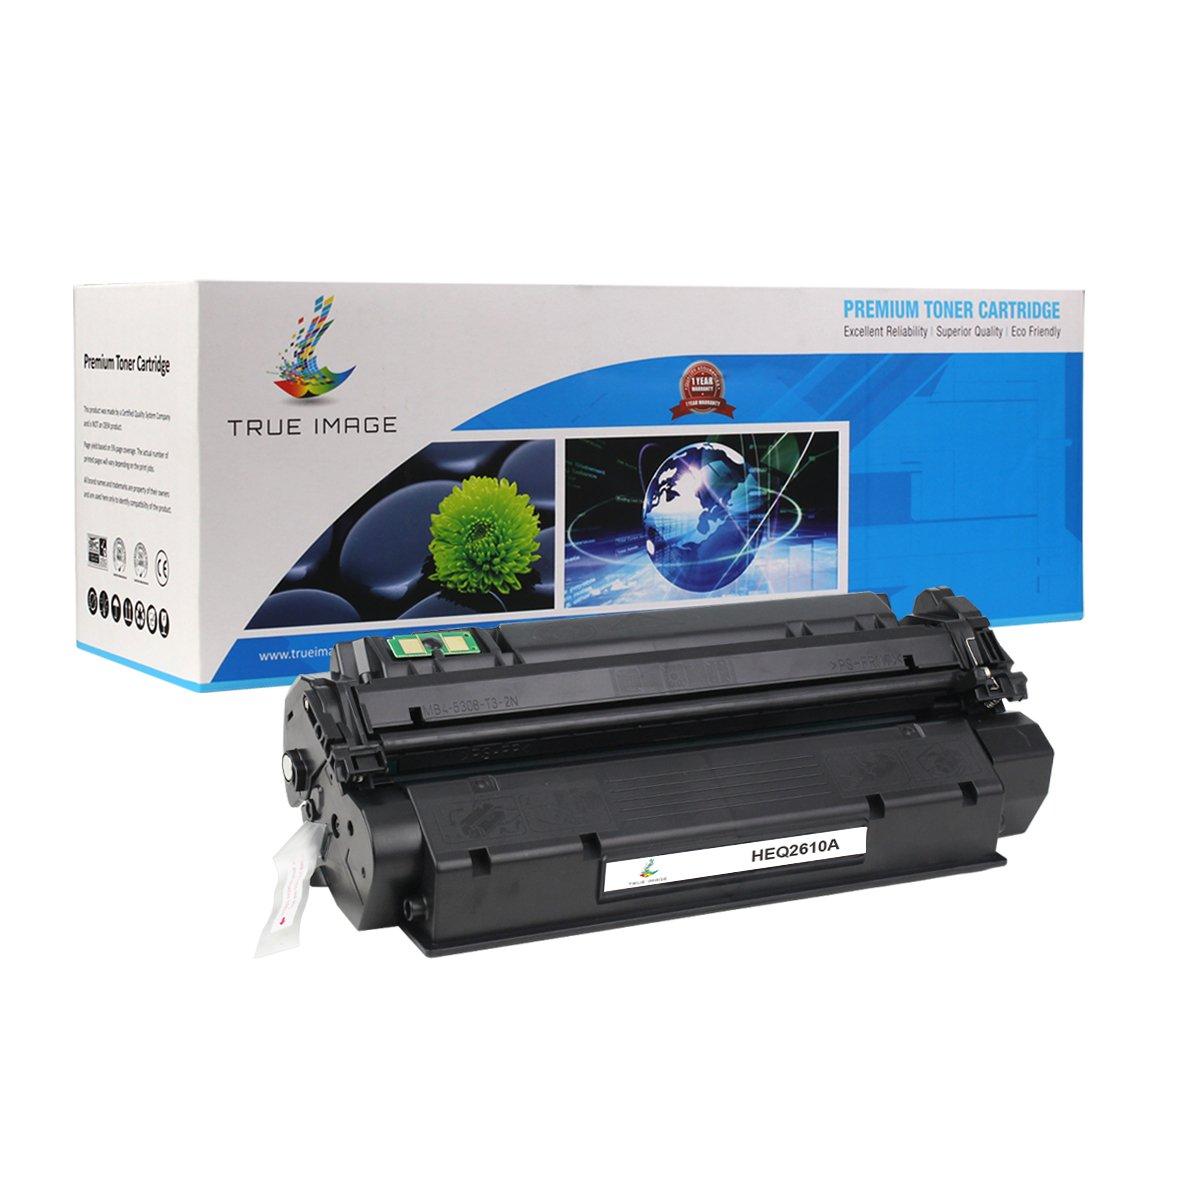 4PK Q2610A 10A Toner Cartridge For HP LaserJet 2300 2300d 2300dn 2300dtn Printer